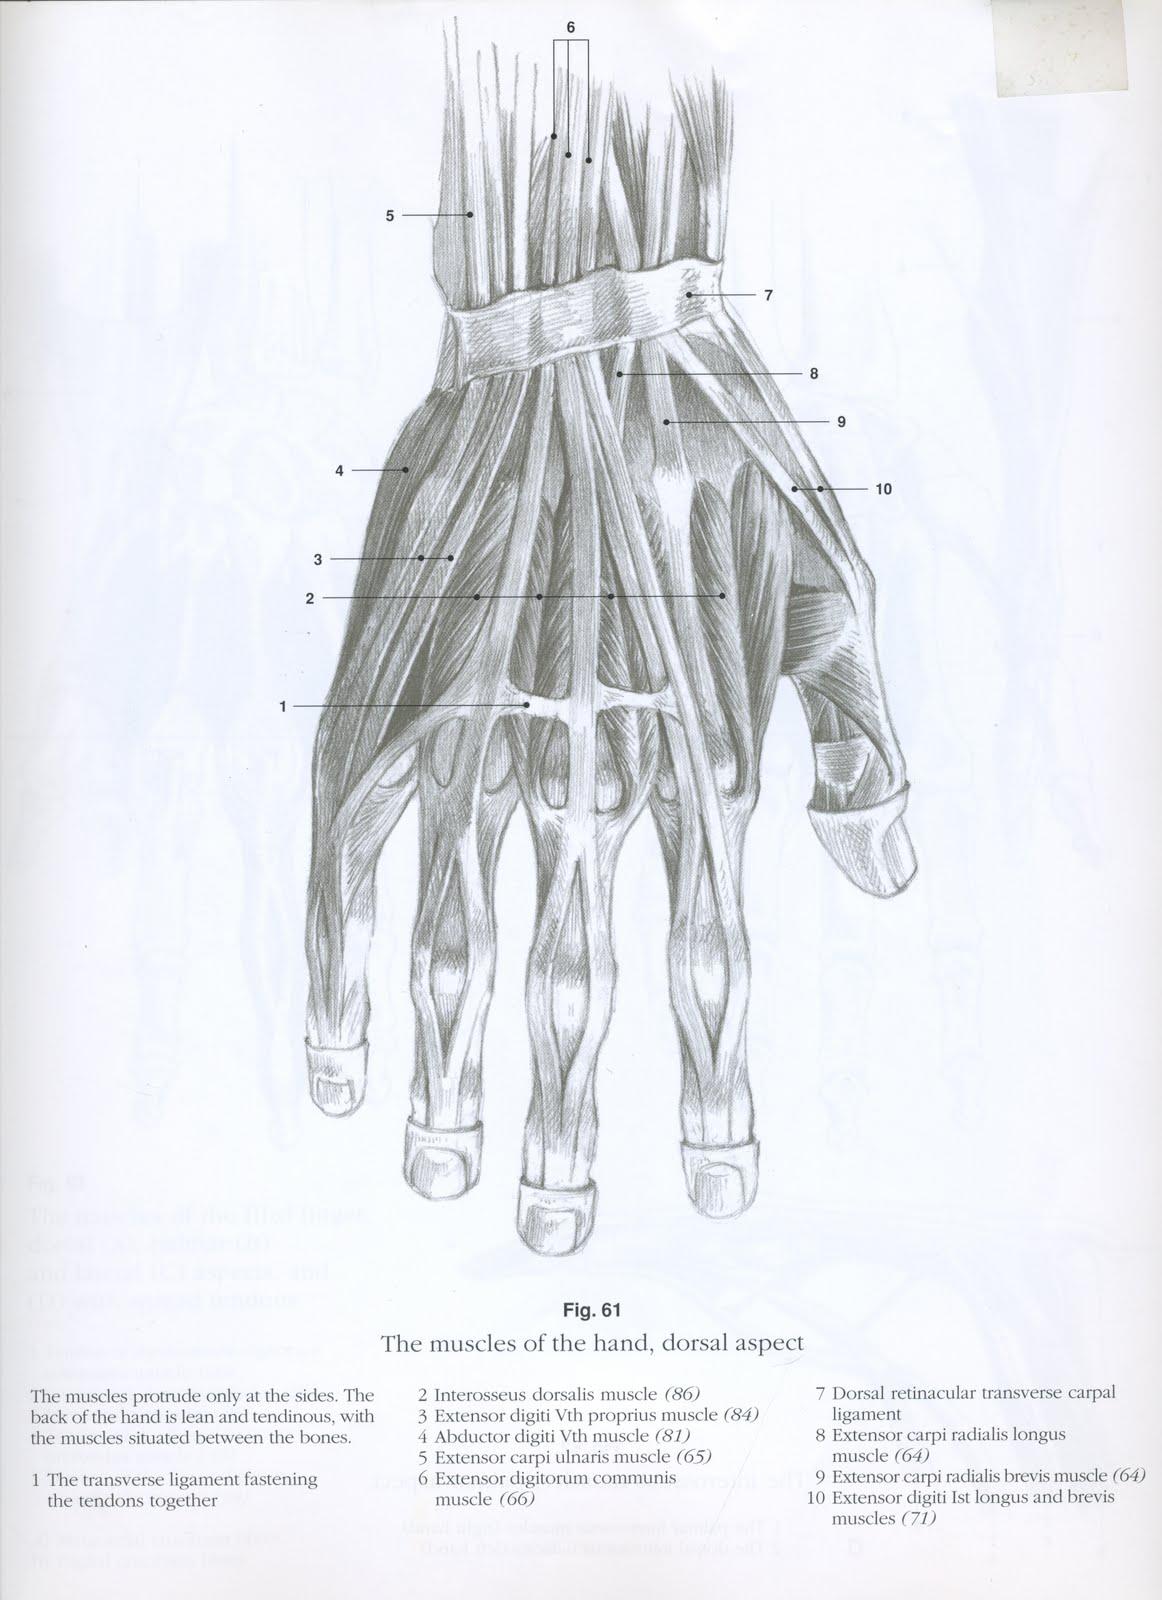 http://3.bp.blogspot.com/_ekfkiJWxZxE/TJpilK1C_II/AAAAAAAAAPo/k9miBDwSt_k/s1600/scan+hand+book.jpg